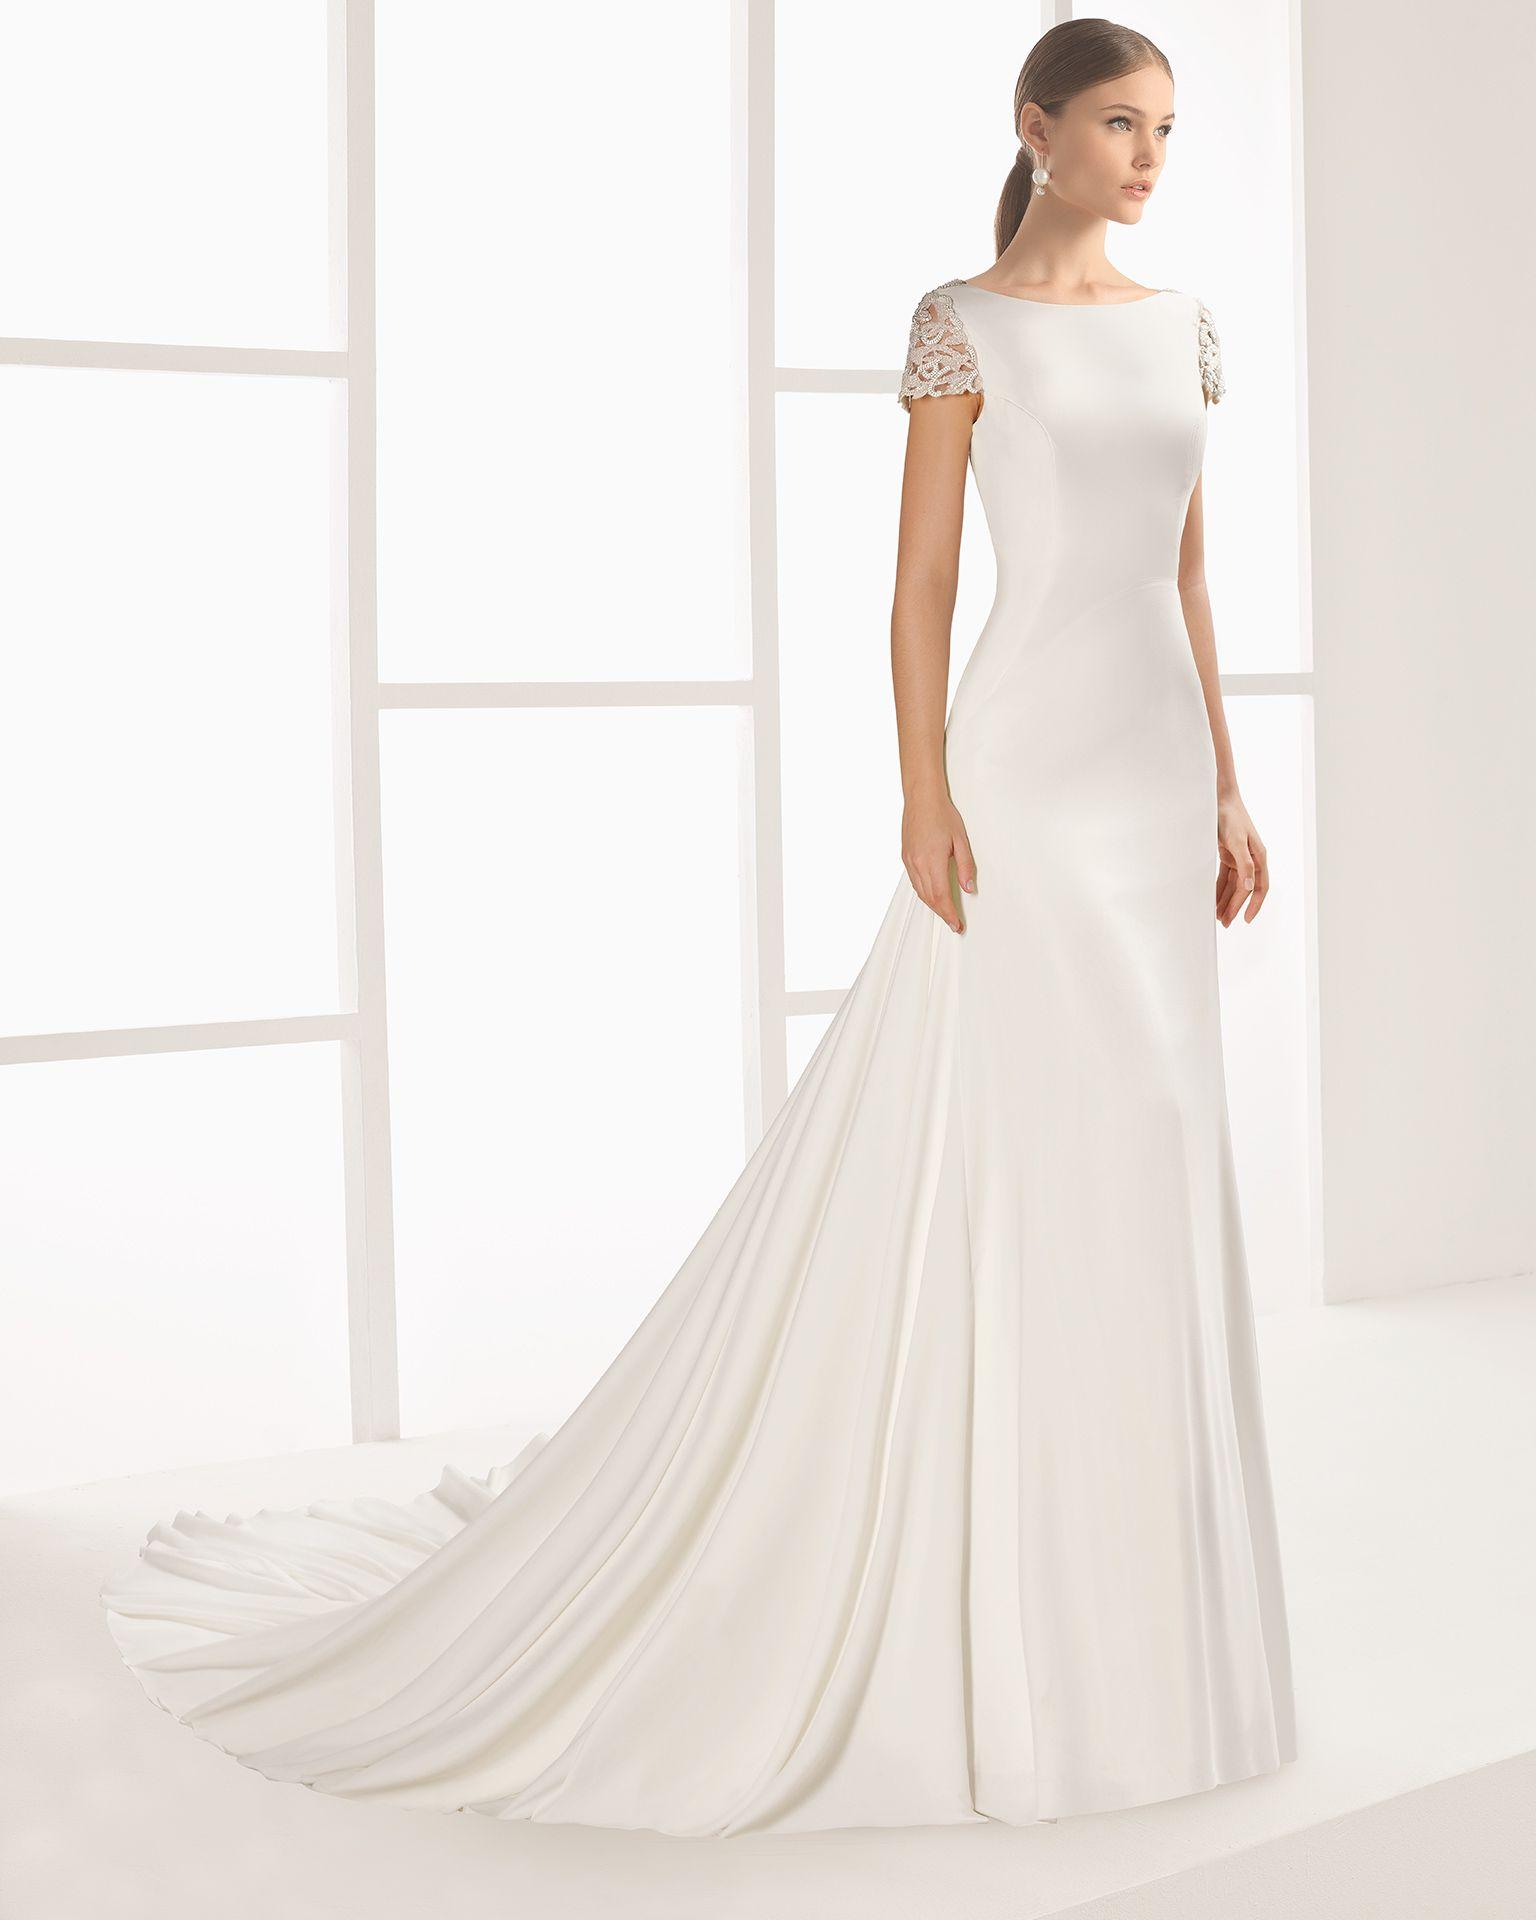 Lightweight wedding dresses  NINETTE  Wedding dresses  Pinterest  Wedding dress Blush